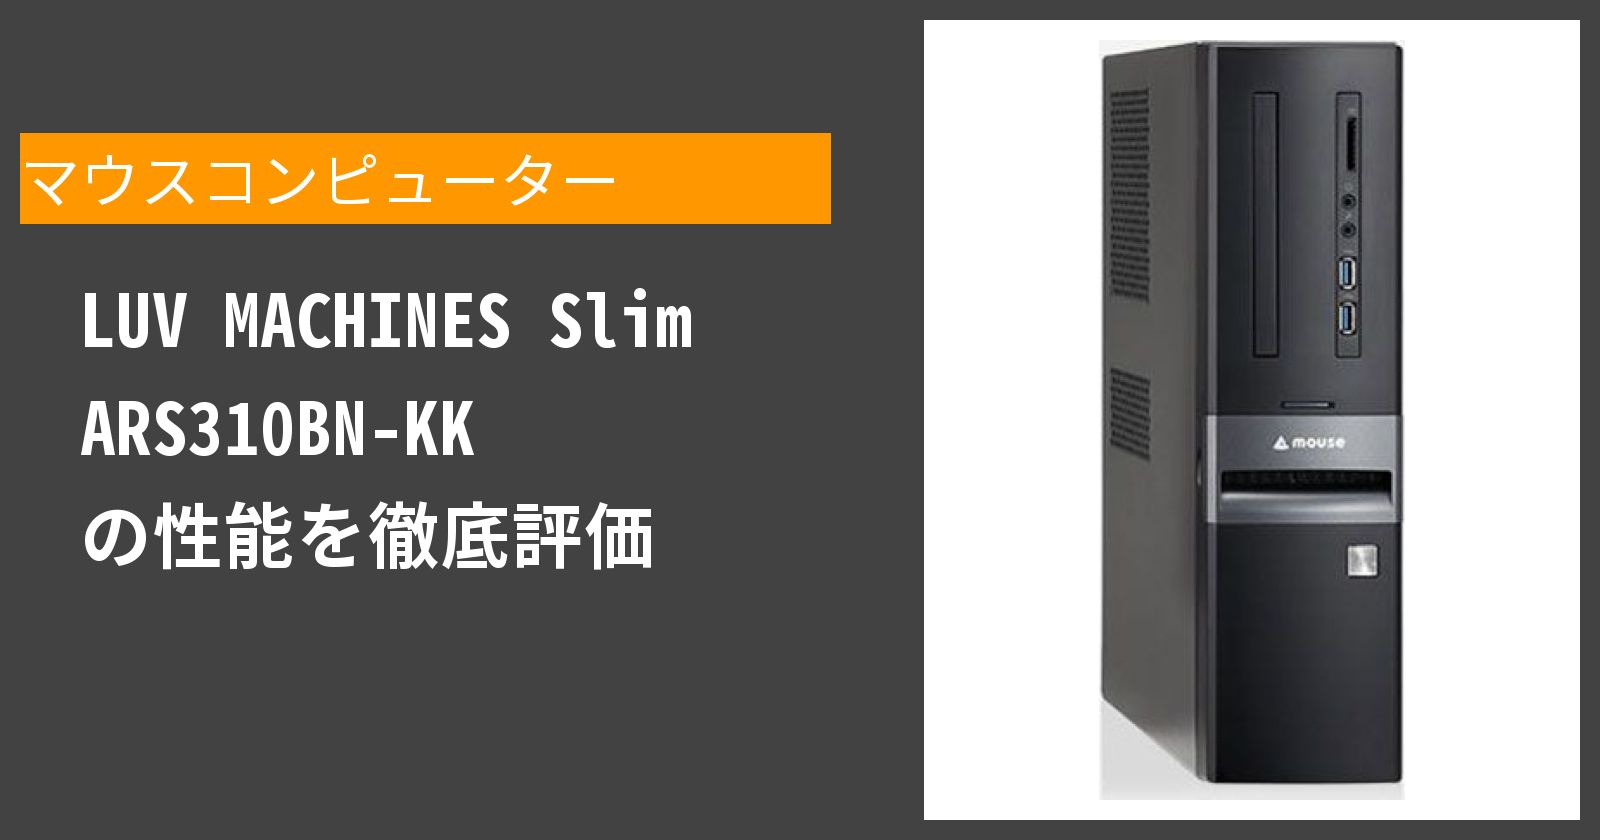 LUV MACHINES Slim ARS310BN-KK の性能を徹底評価